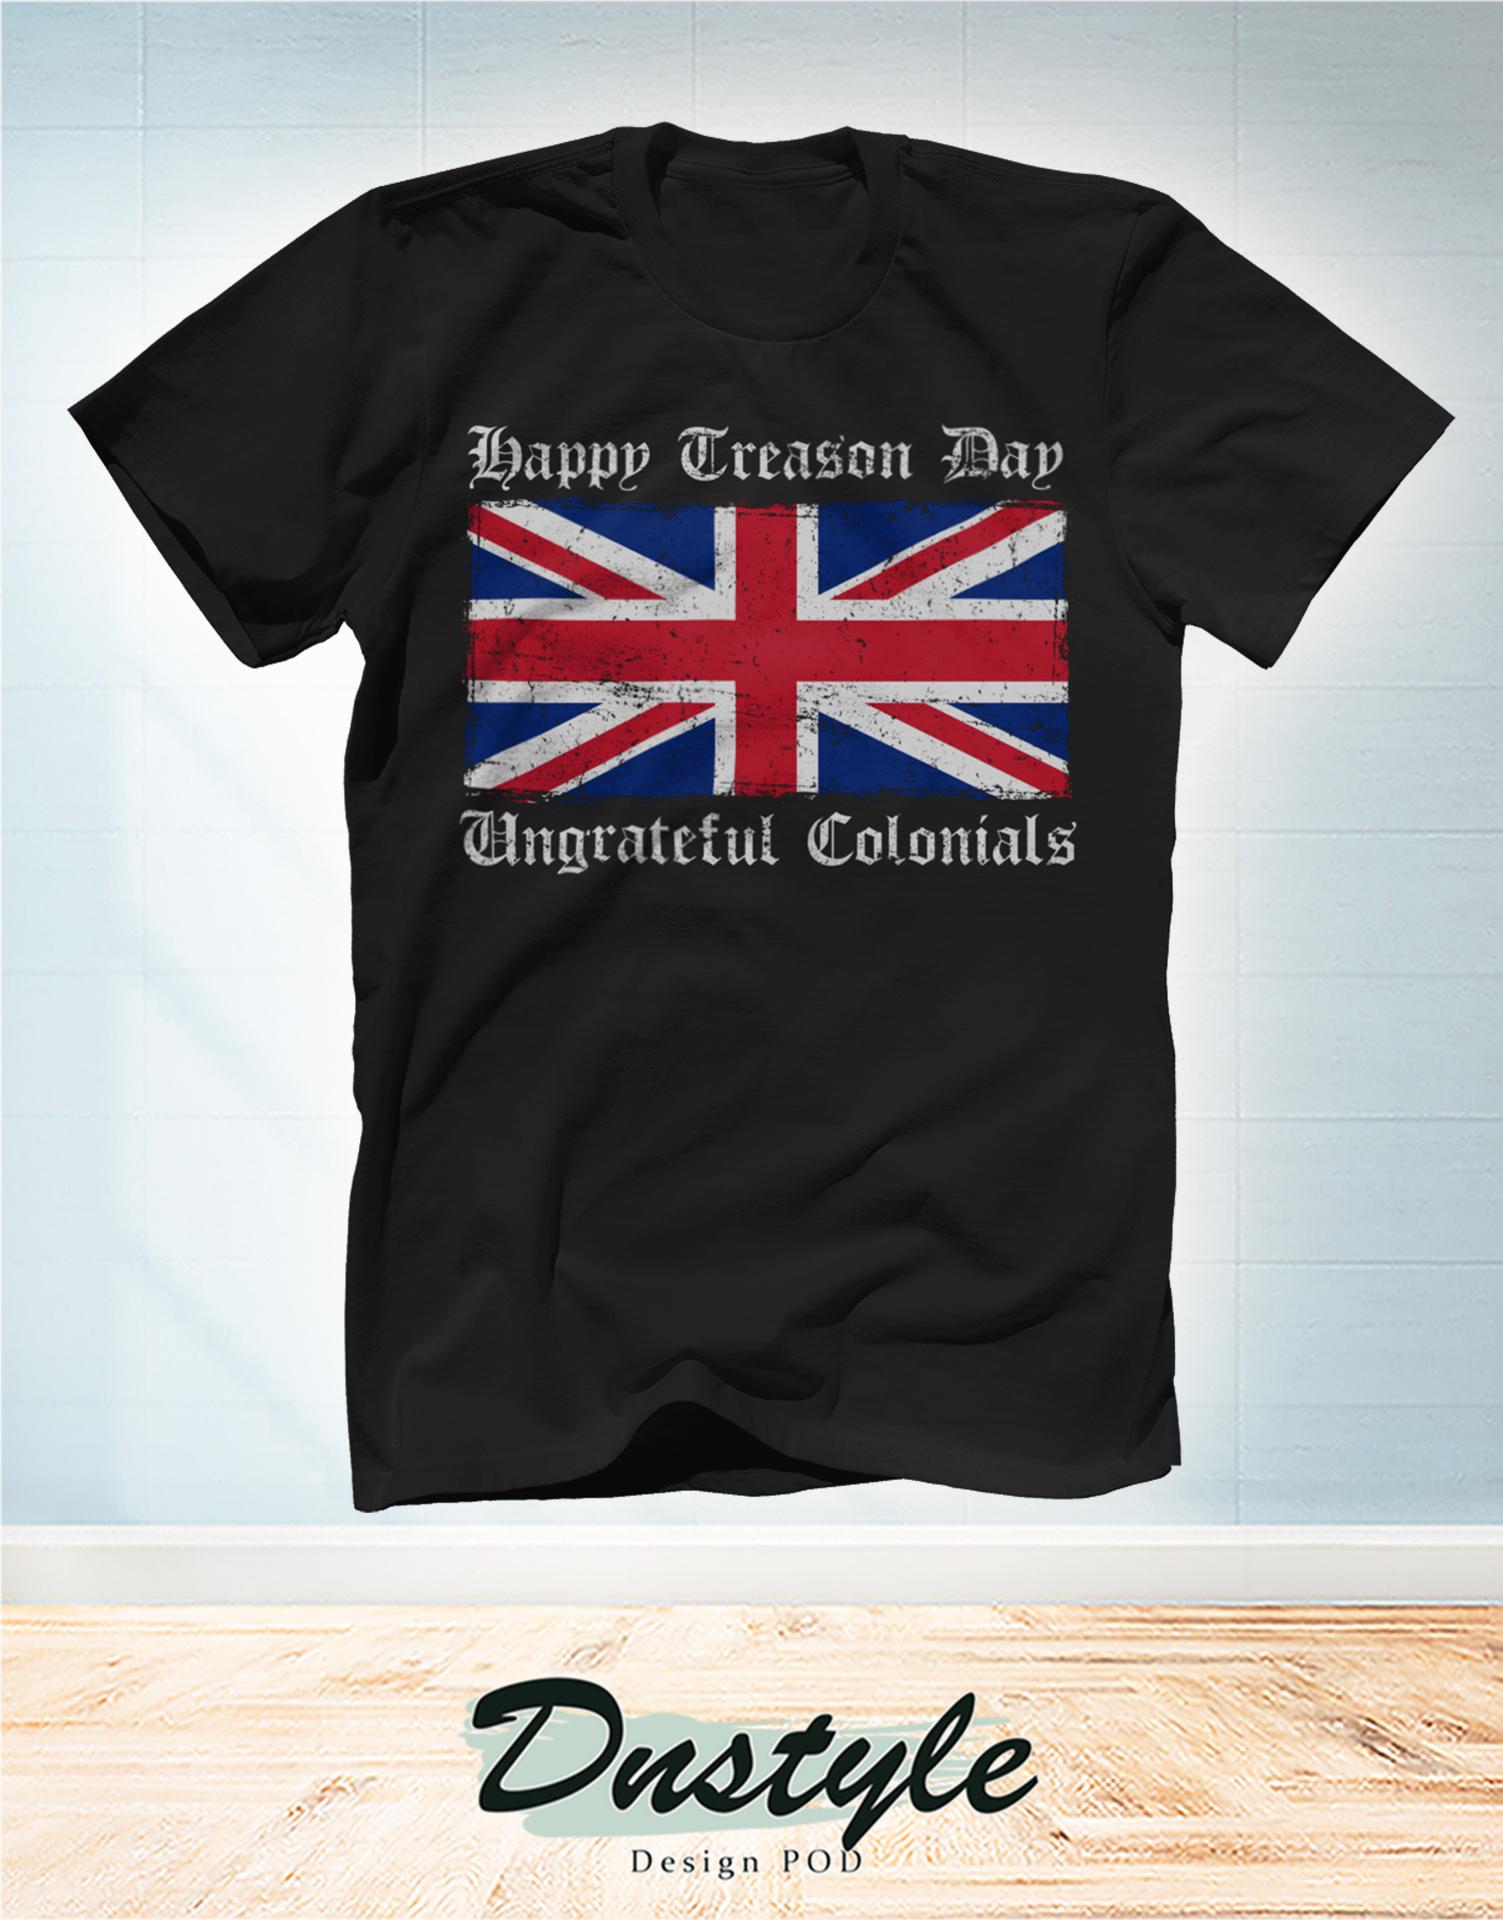 Happy treason day ungrateful colonials t-shirt